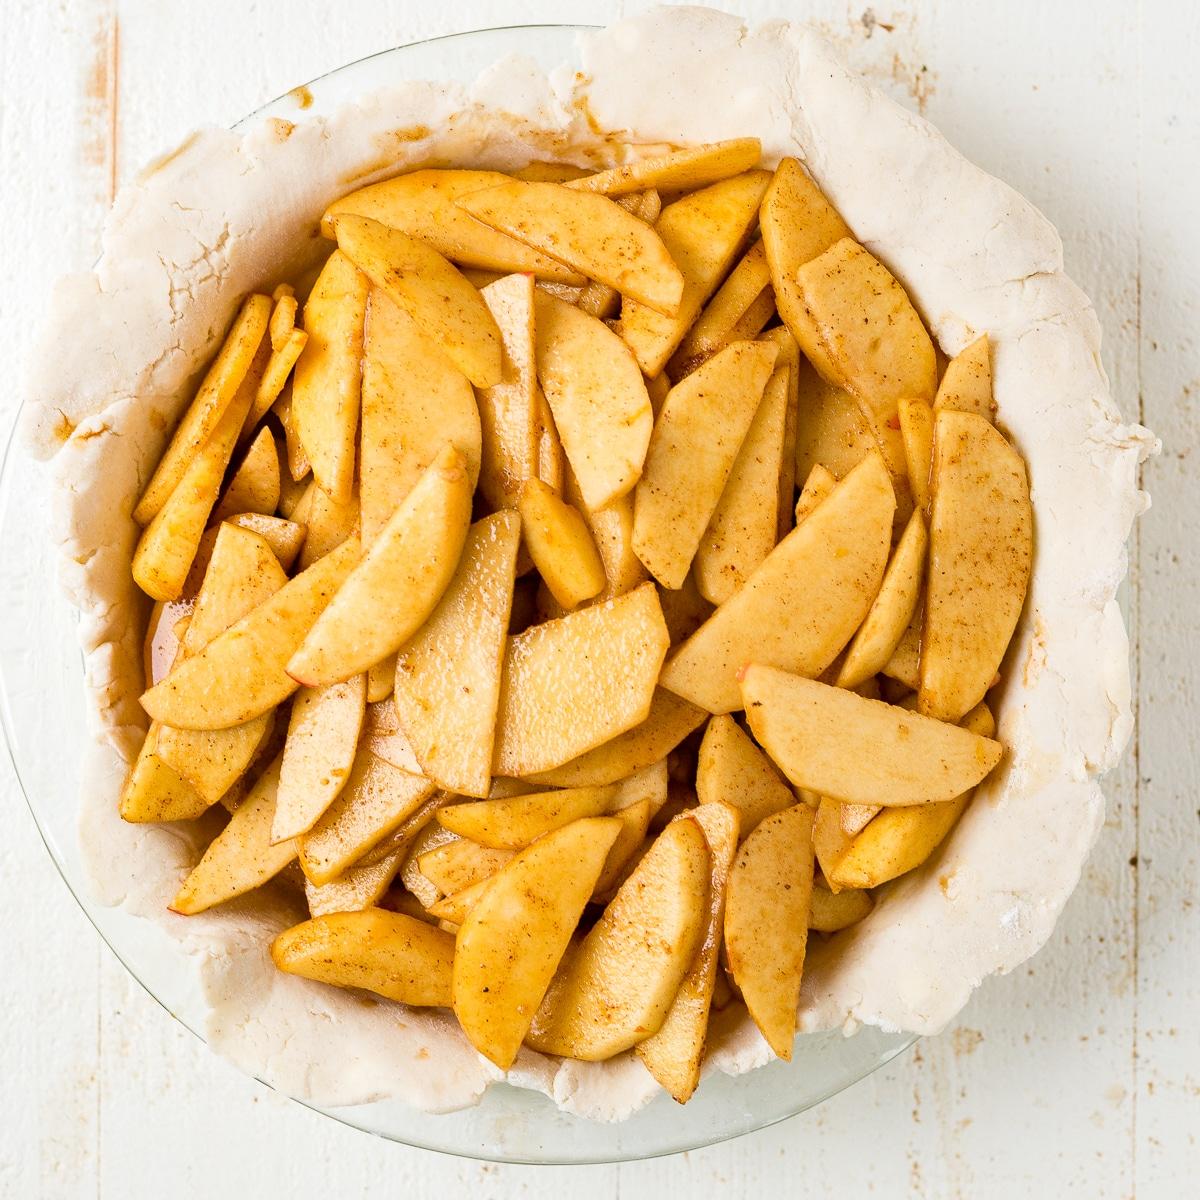 gluten free apple pie filling in the crust before baking